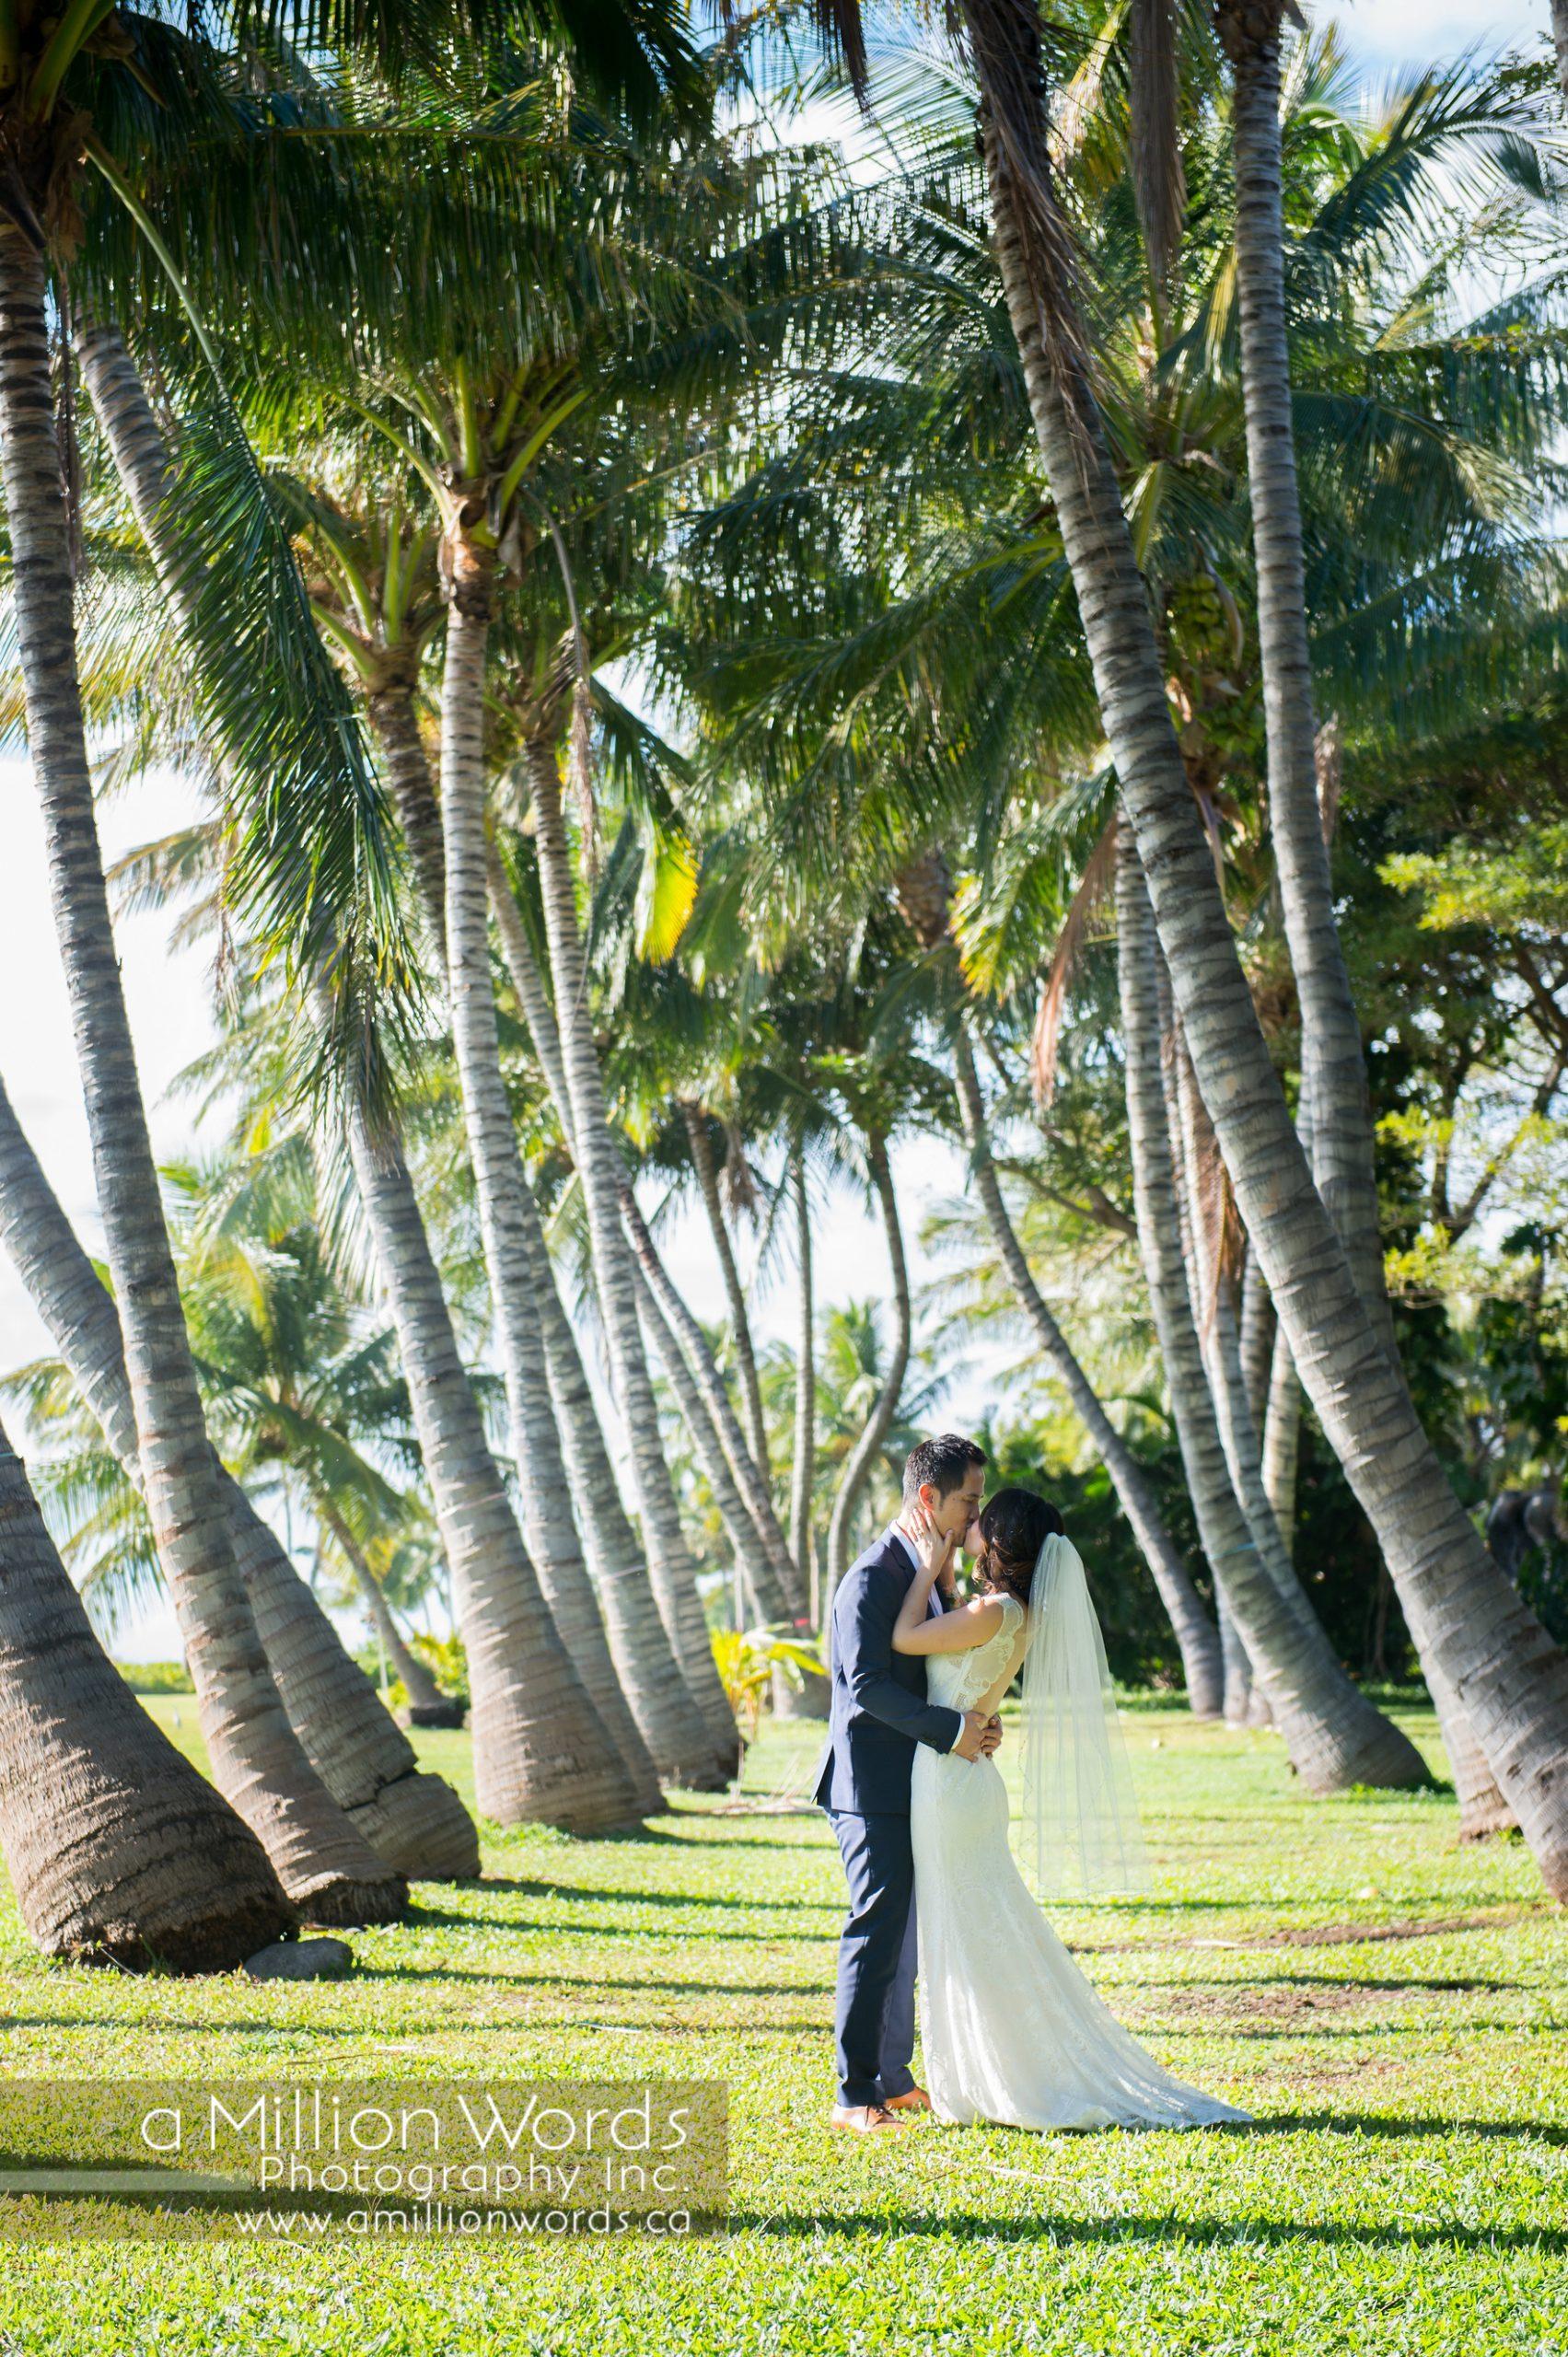 kw_destination_wedding_photography22